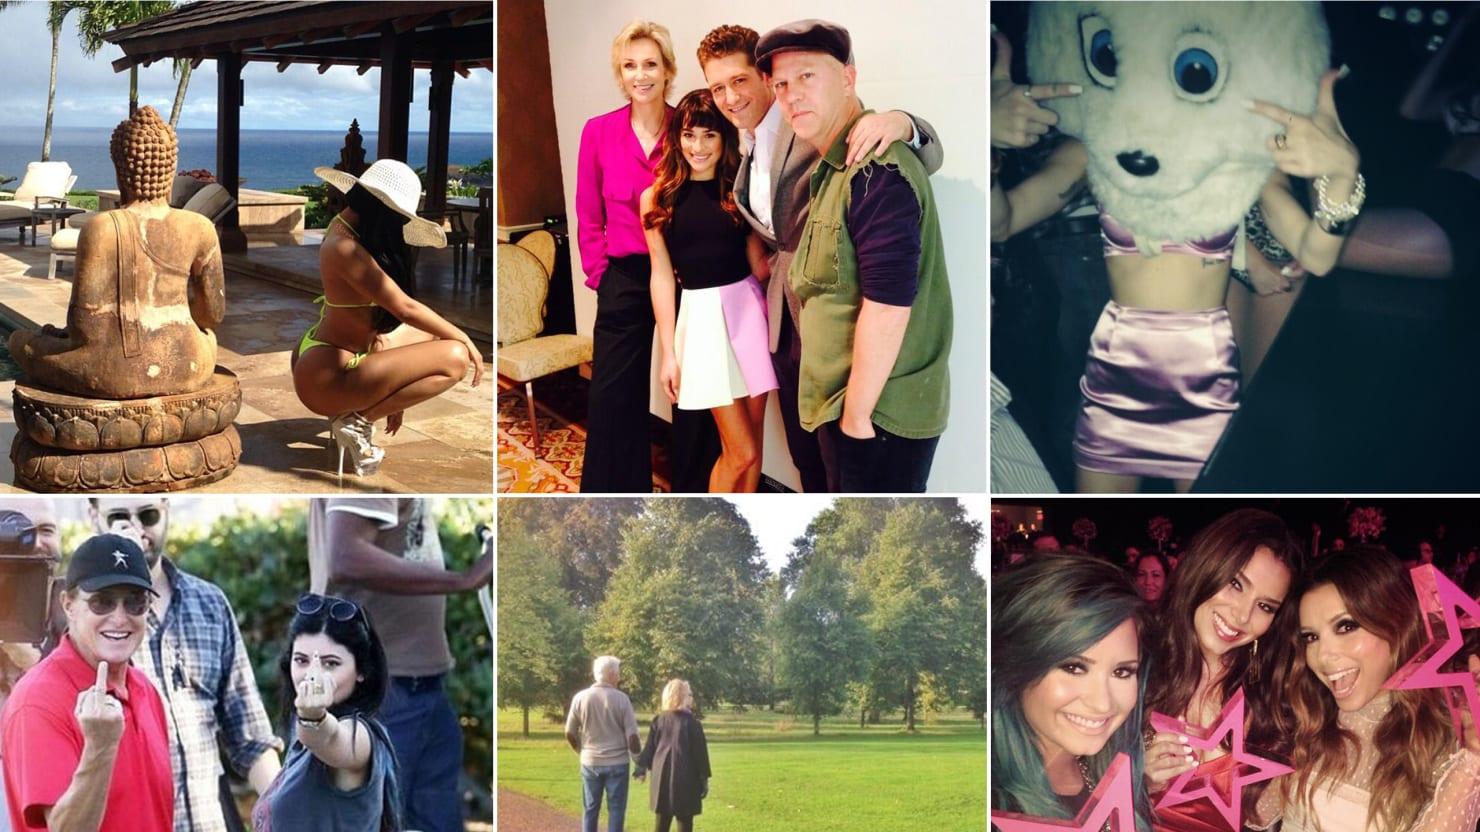 Lea Michele, Nicki Minaj & More Celebrity Twitter Pictures (PHOTOS)